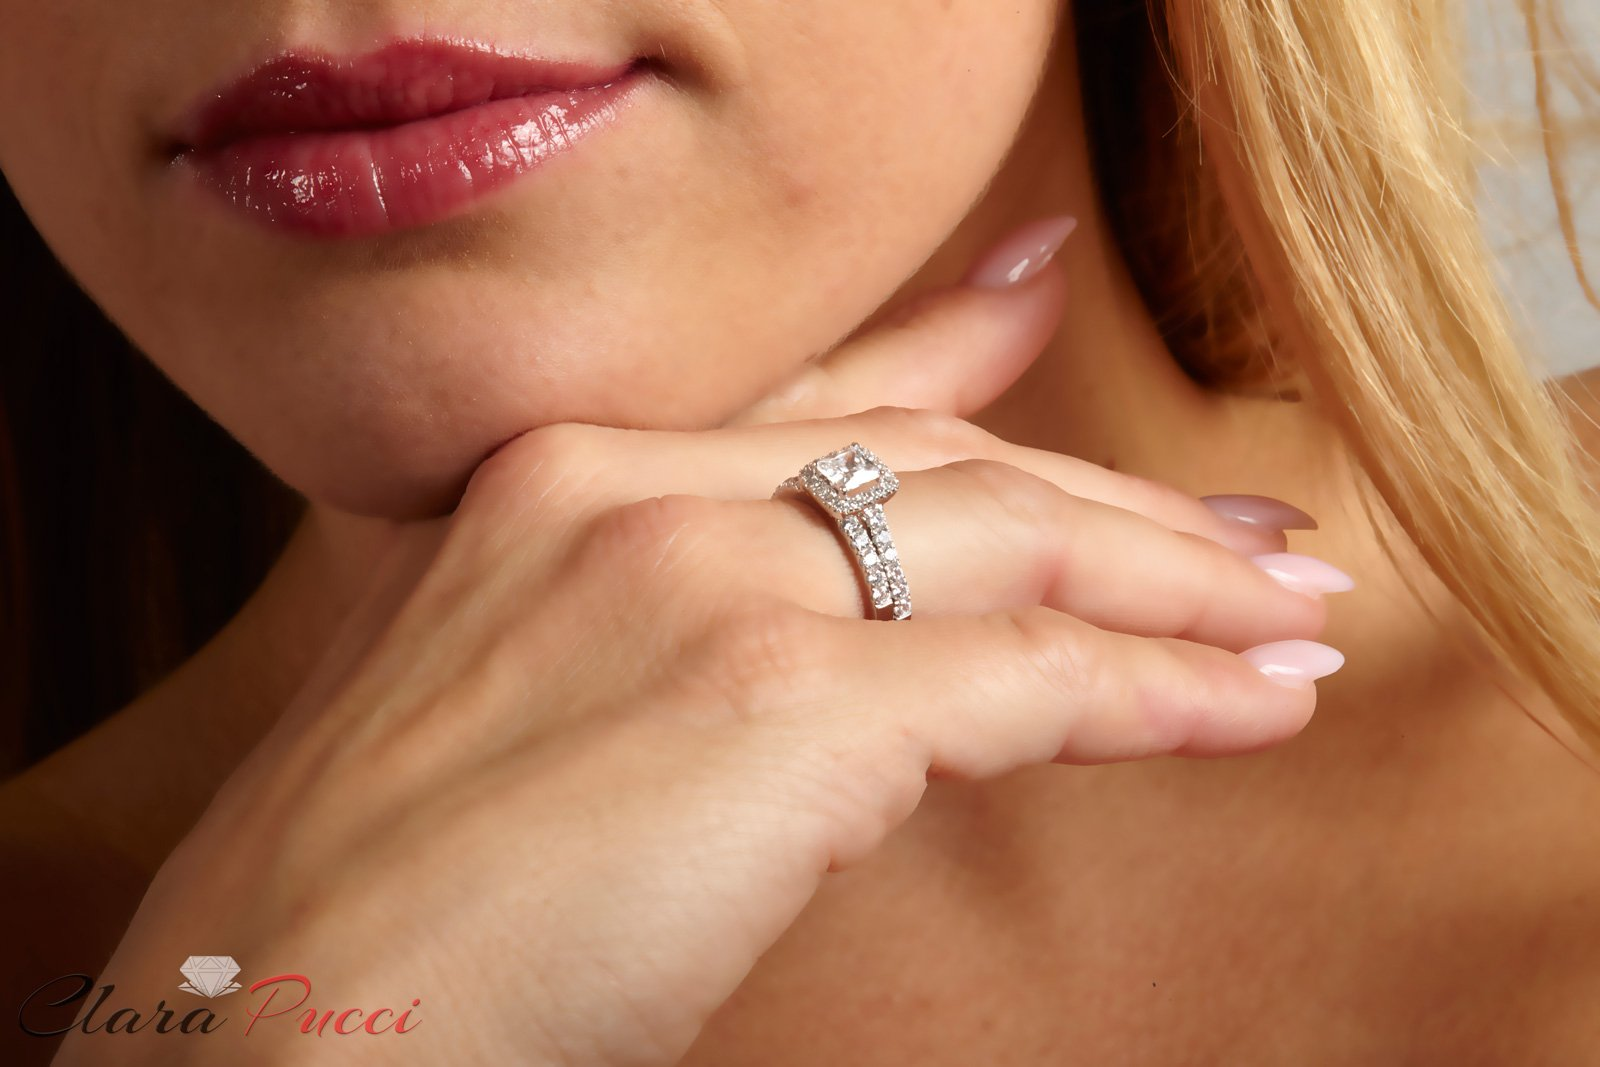 Clara Pucci 1.60 CT Princess Cut CZ Pave Halo Bridal Engagement Wedding Ring Band Set 14k White Gold, Size 8.5 by Clara Pucci (Image #5)